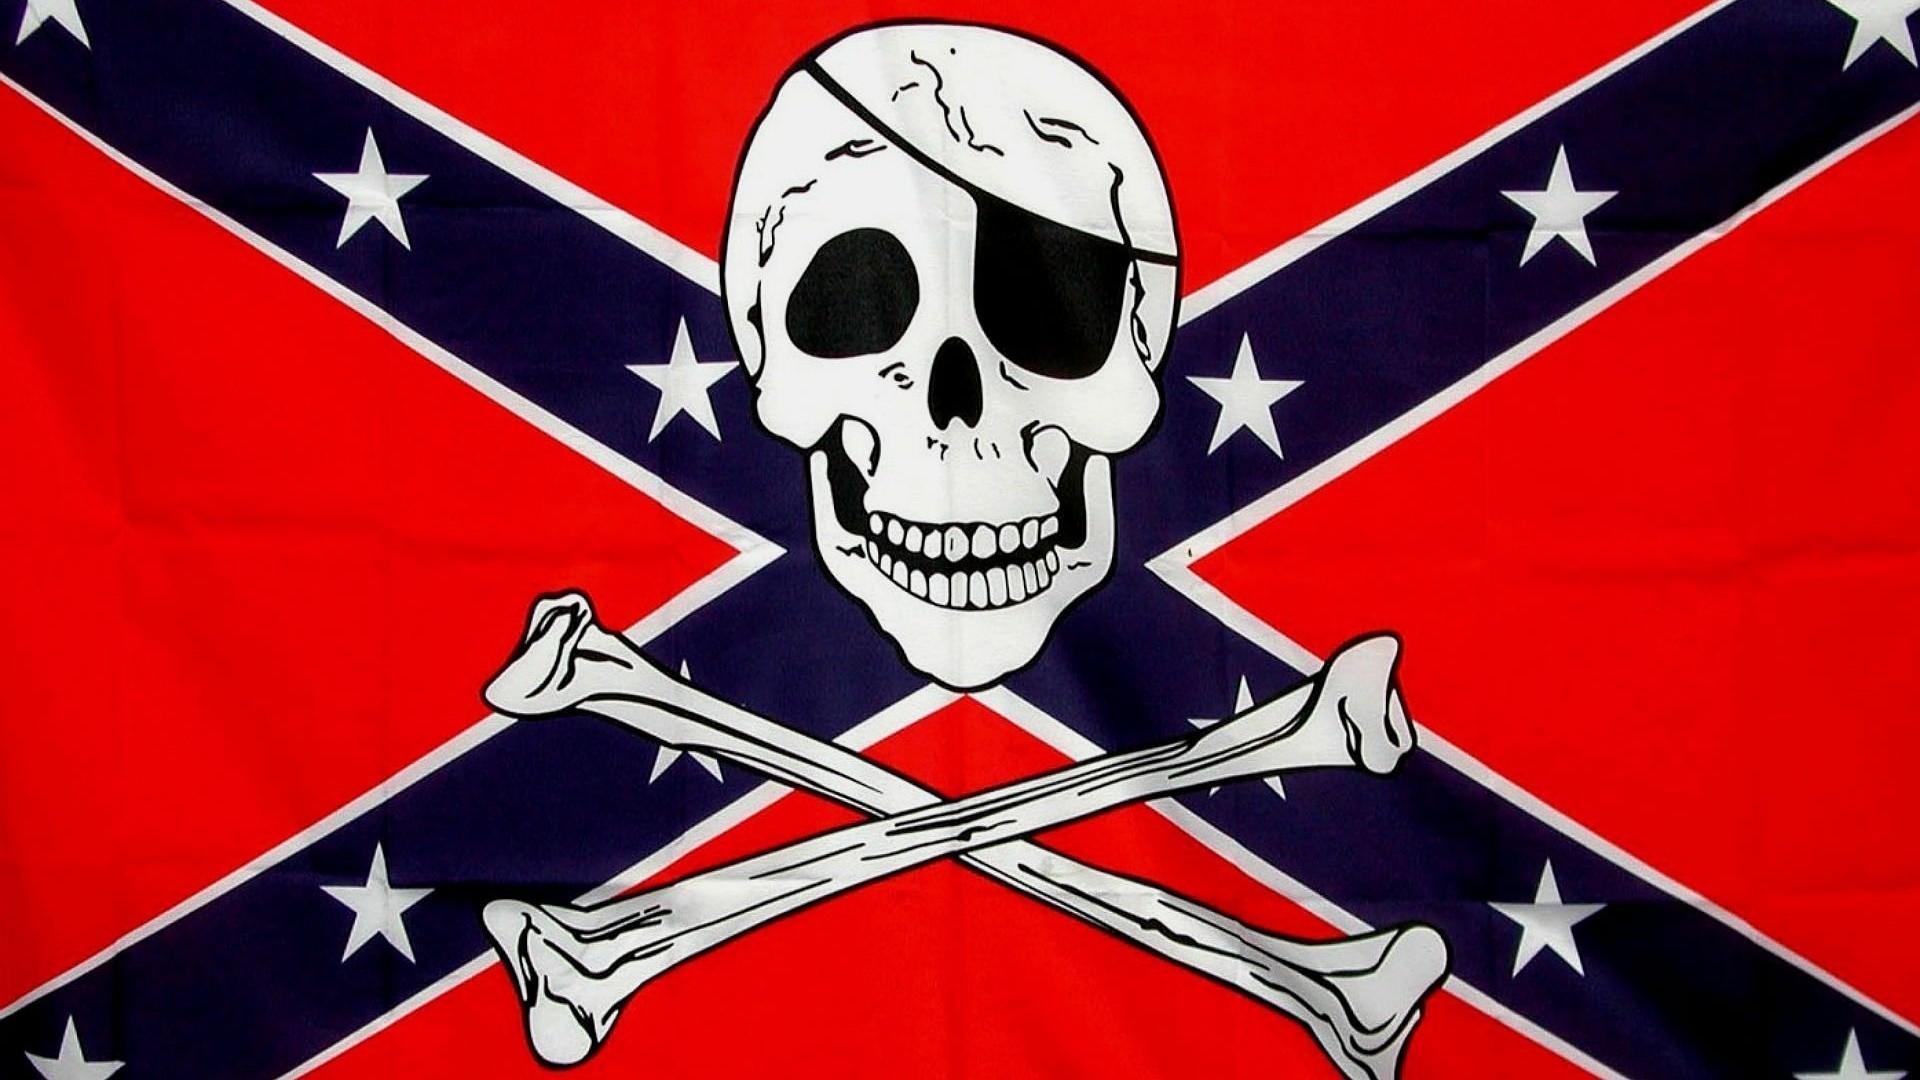 Rebel Flag Backgrounds (52+ pictures)